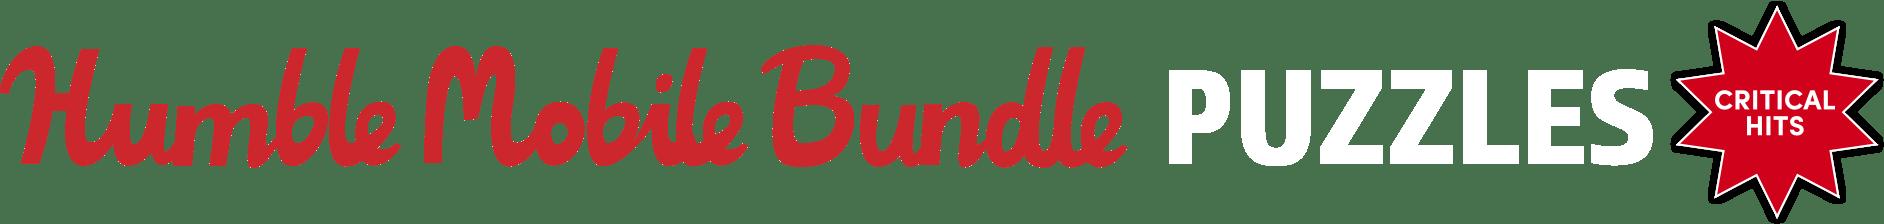 Humble Mobile Bundle: Puzzles (Critical Hits)